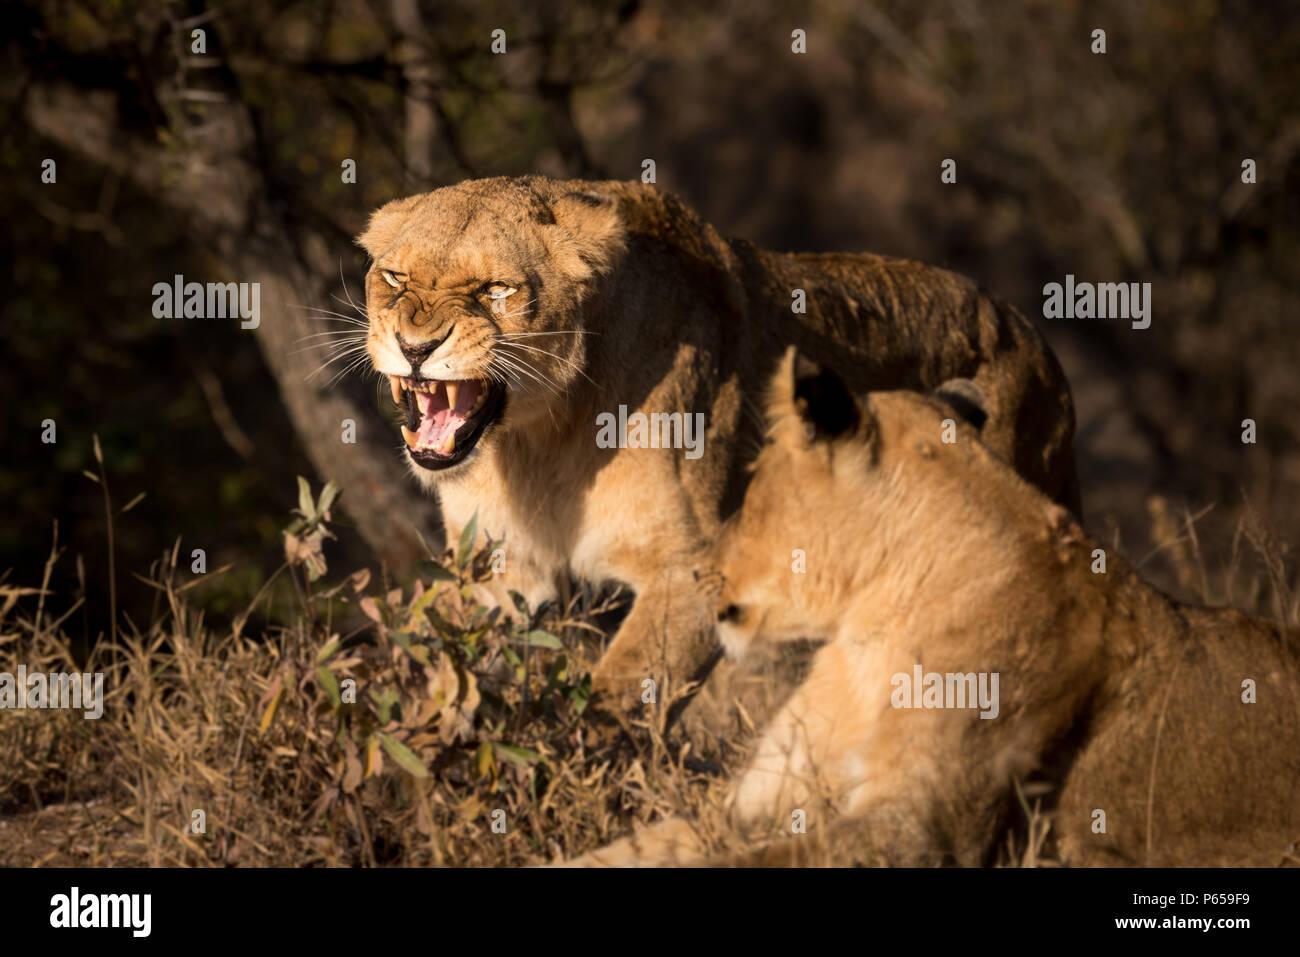 Lioness roaring - Stock Image